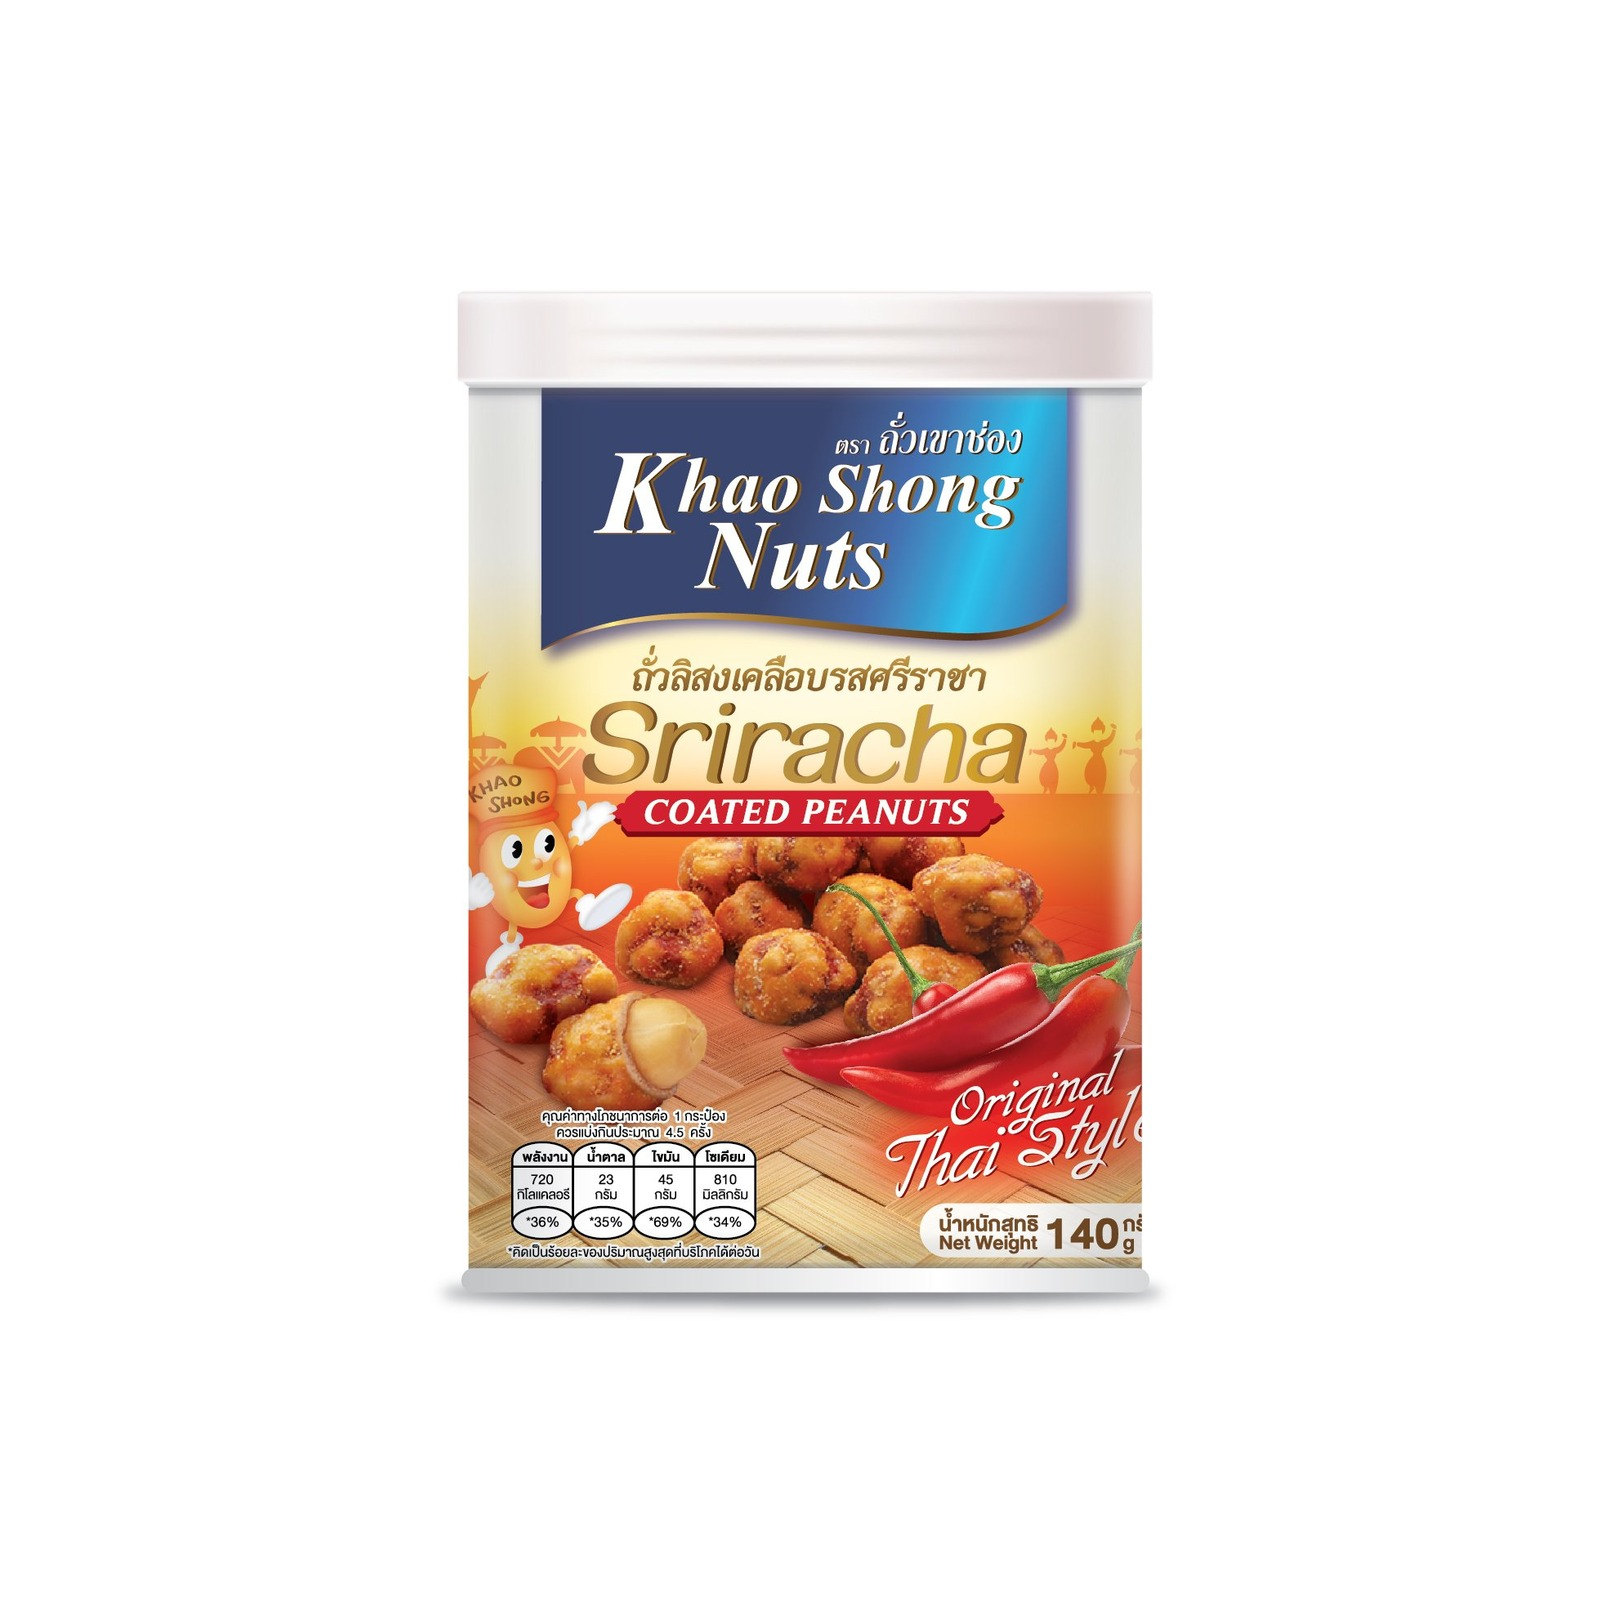 Khao Shong Nuts Sriracha Coated Peanuts